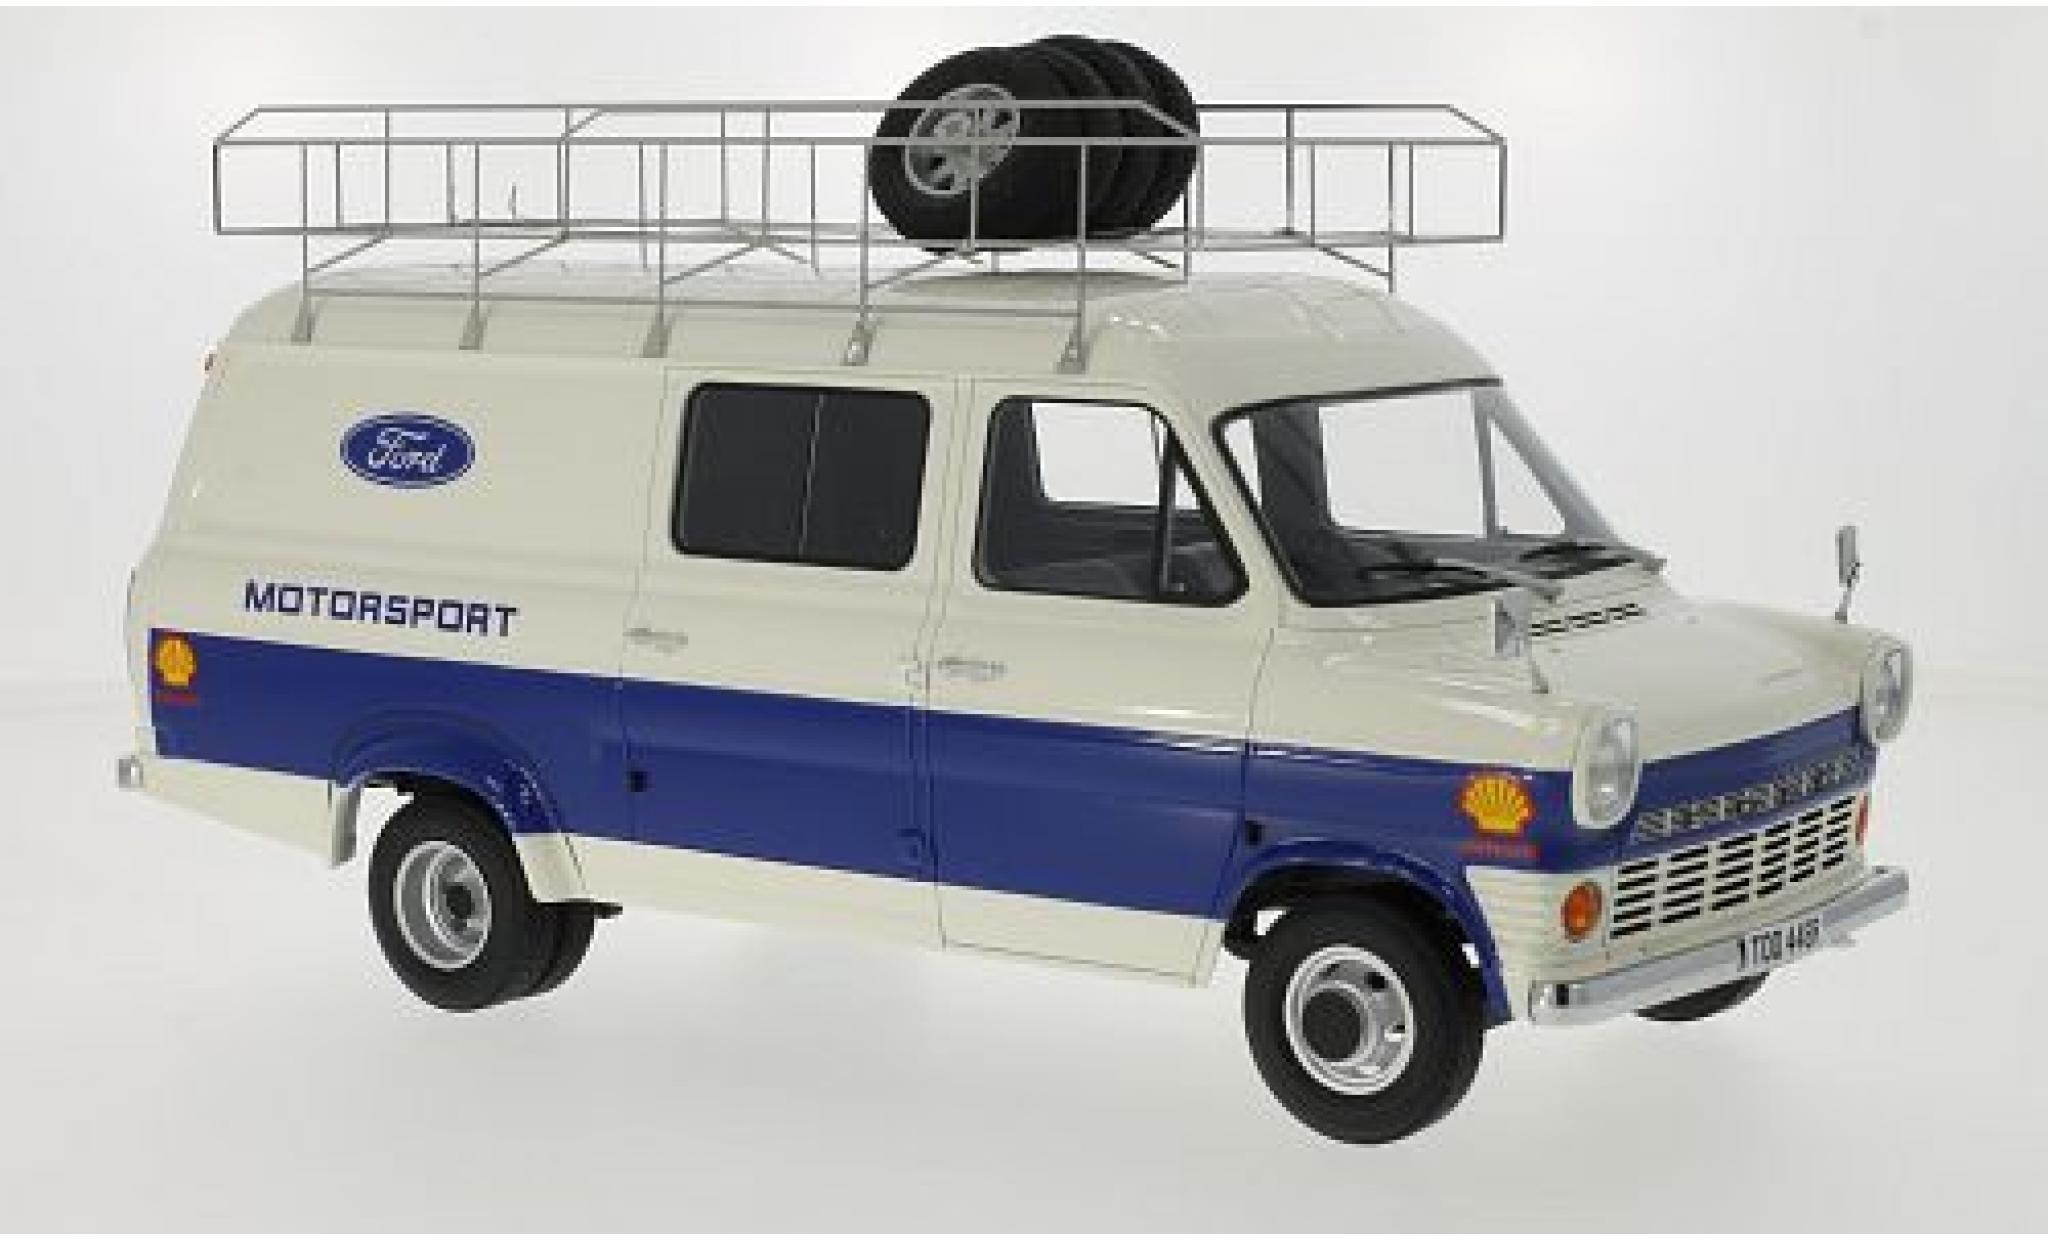 Ford Transit 1/18 Premium ClassiXXs MKI Motorsport 1970